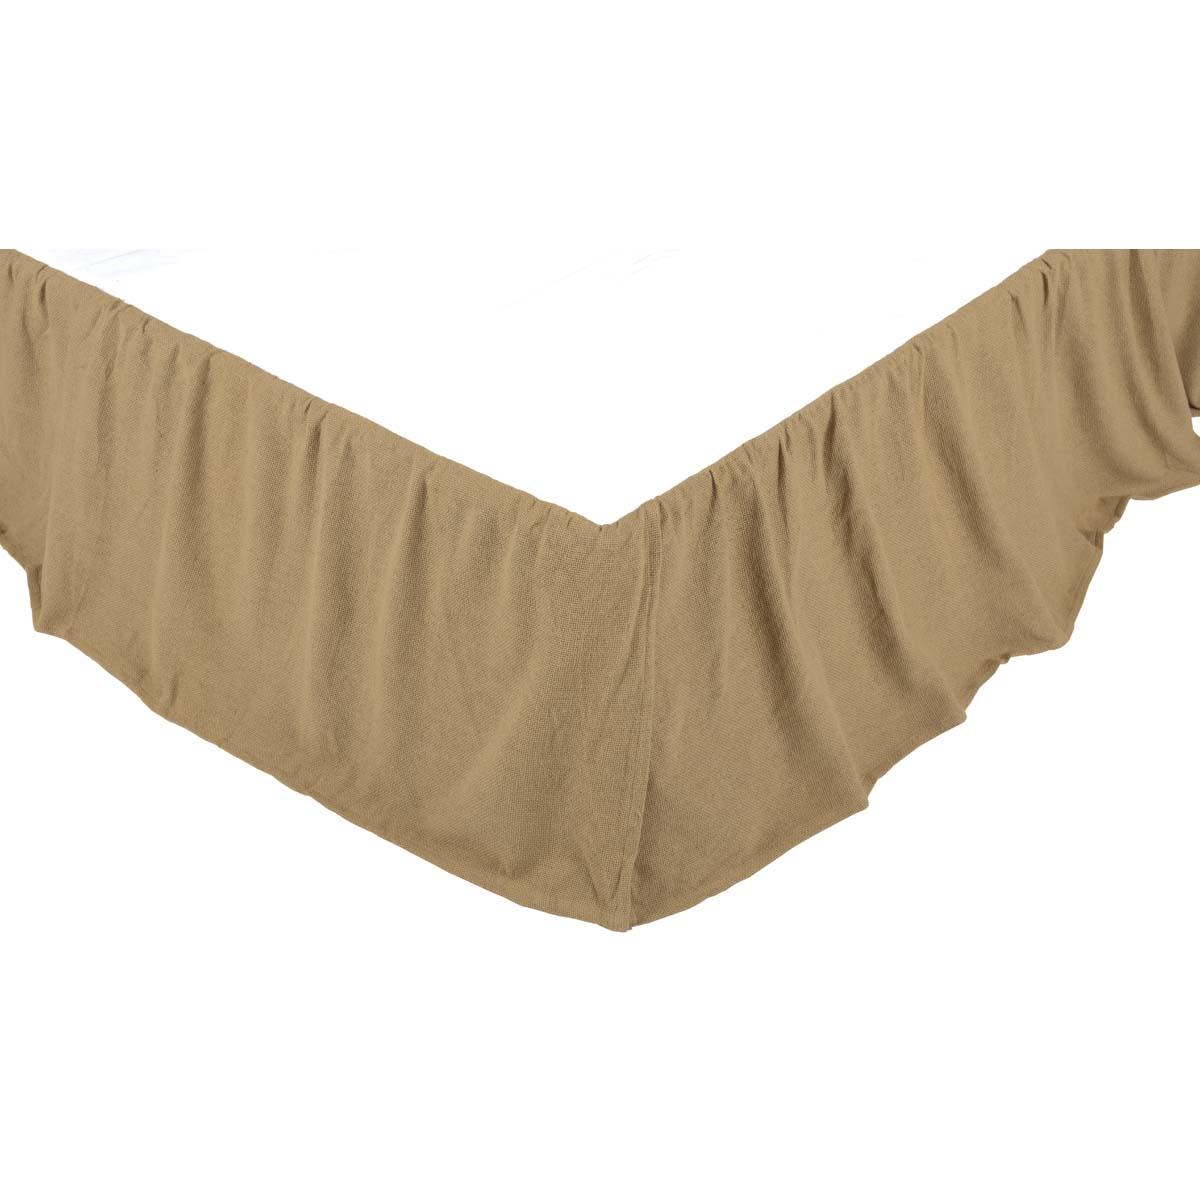 Burlap Natural Ruffled Twin Bed Skirt 39x76x16